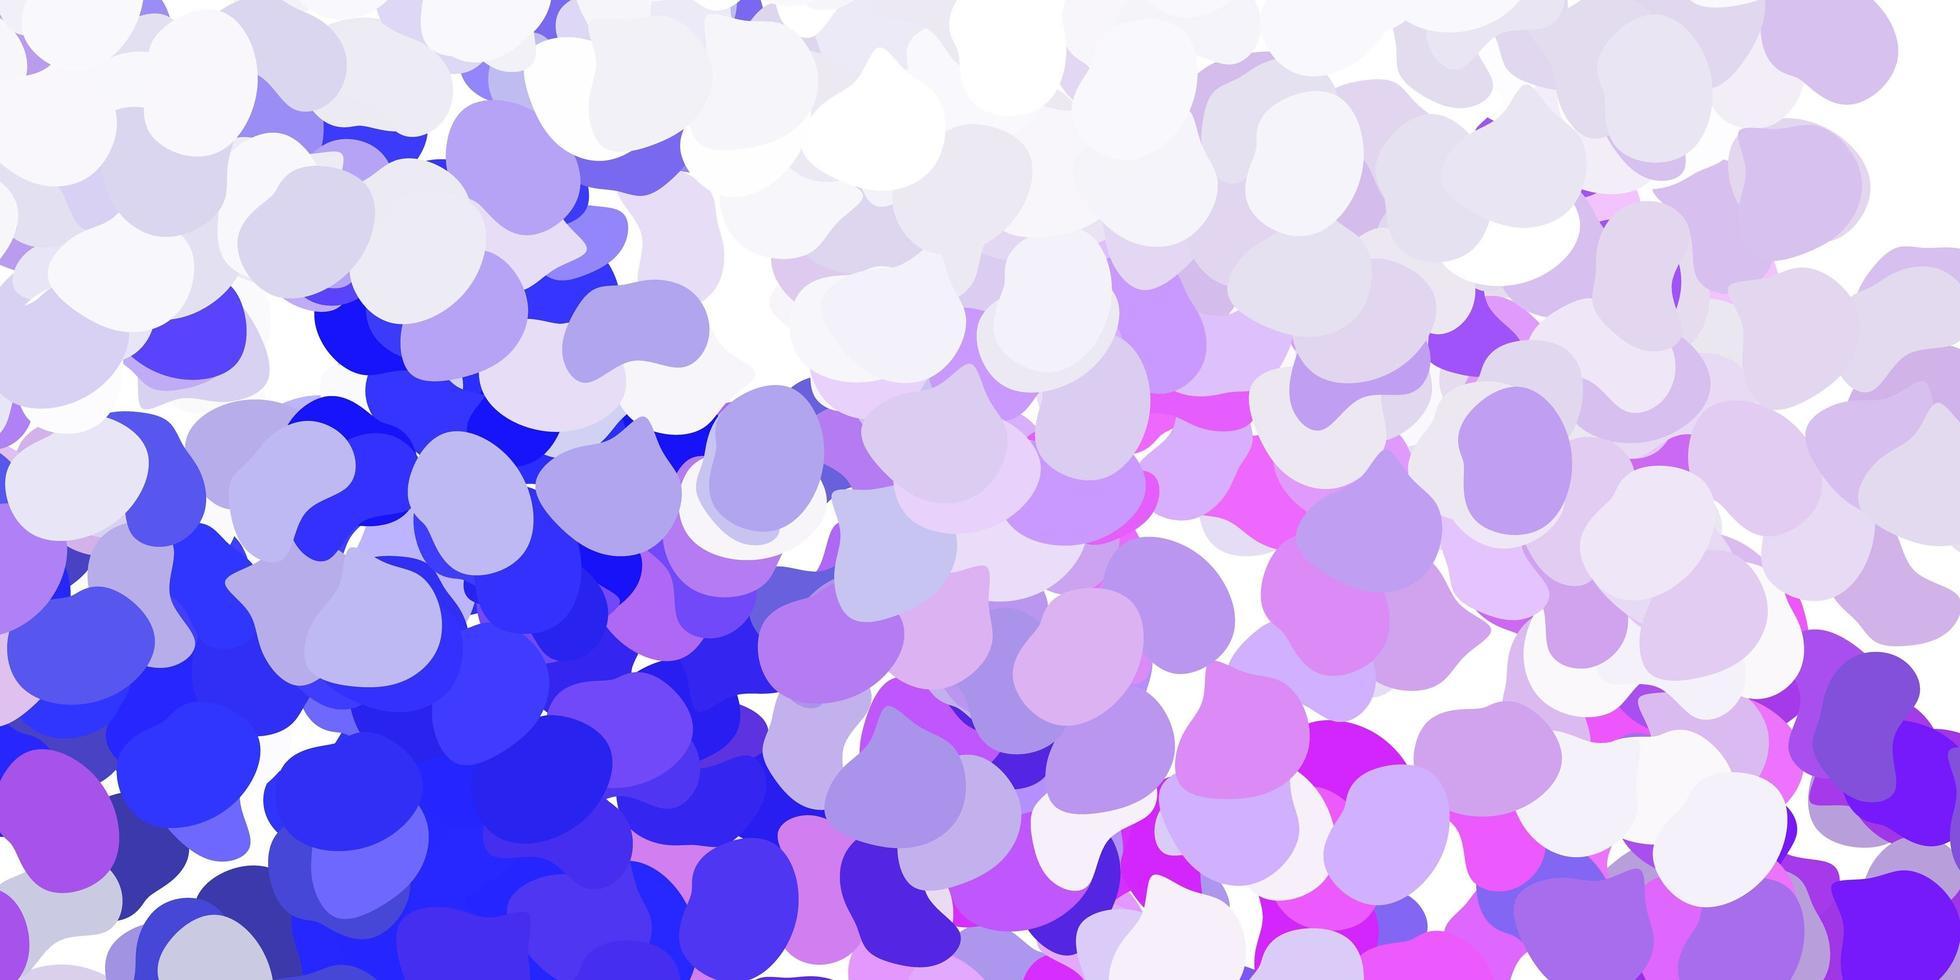 pano de fundo rosa claro, azul vector com formas caóticas.